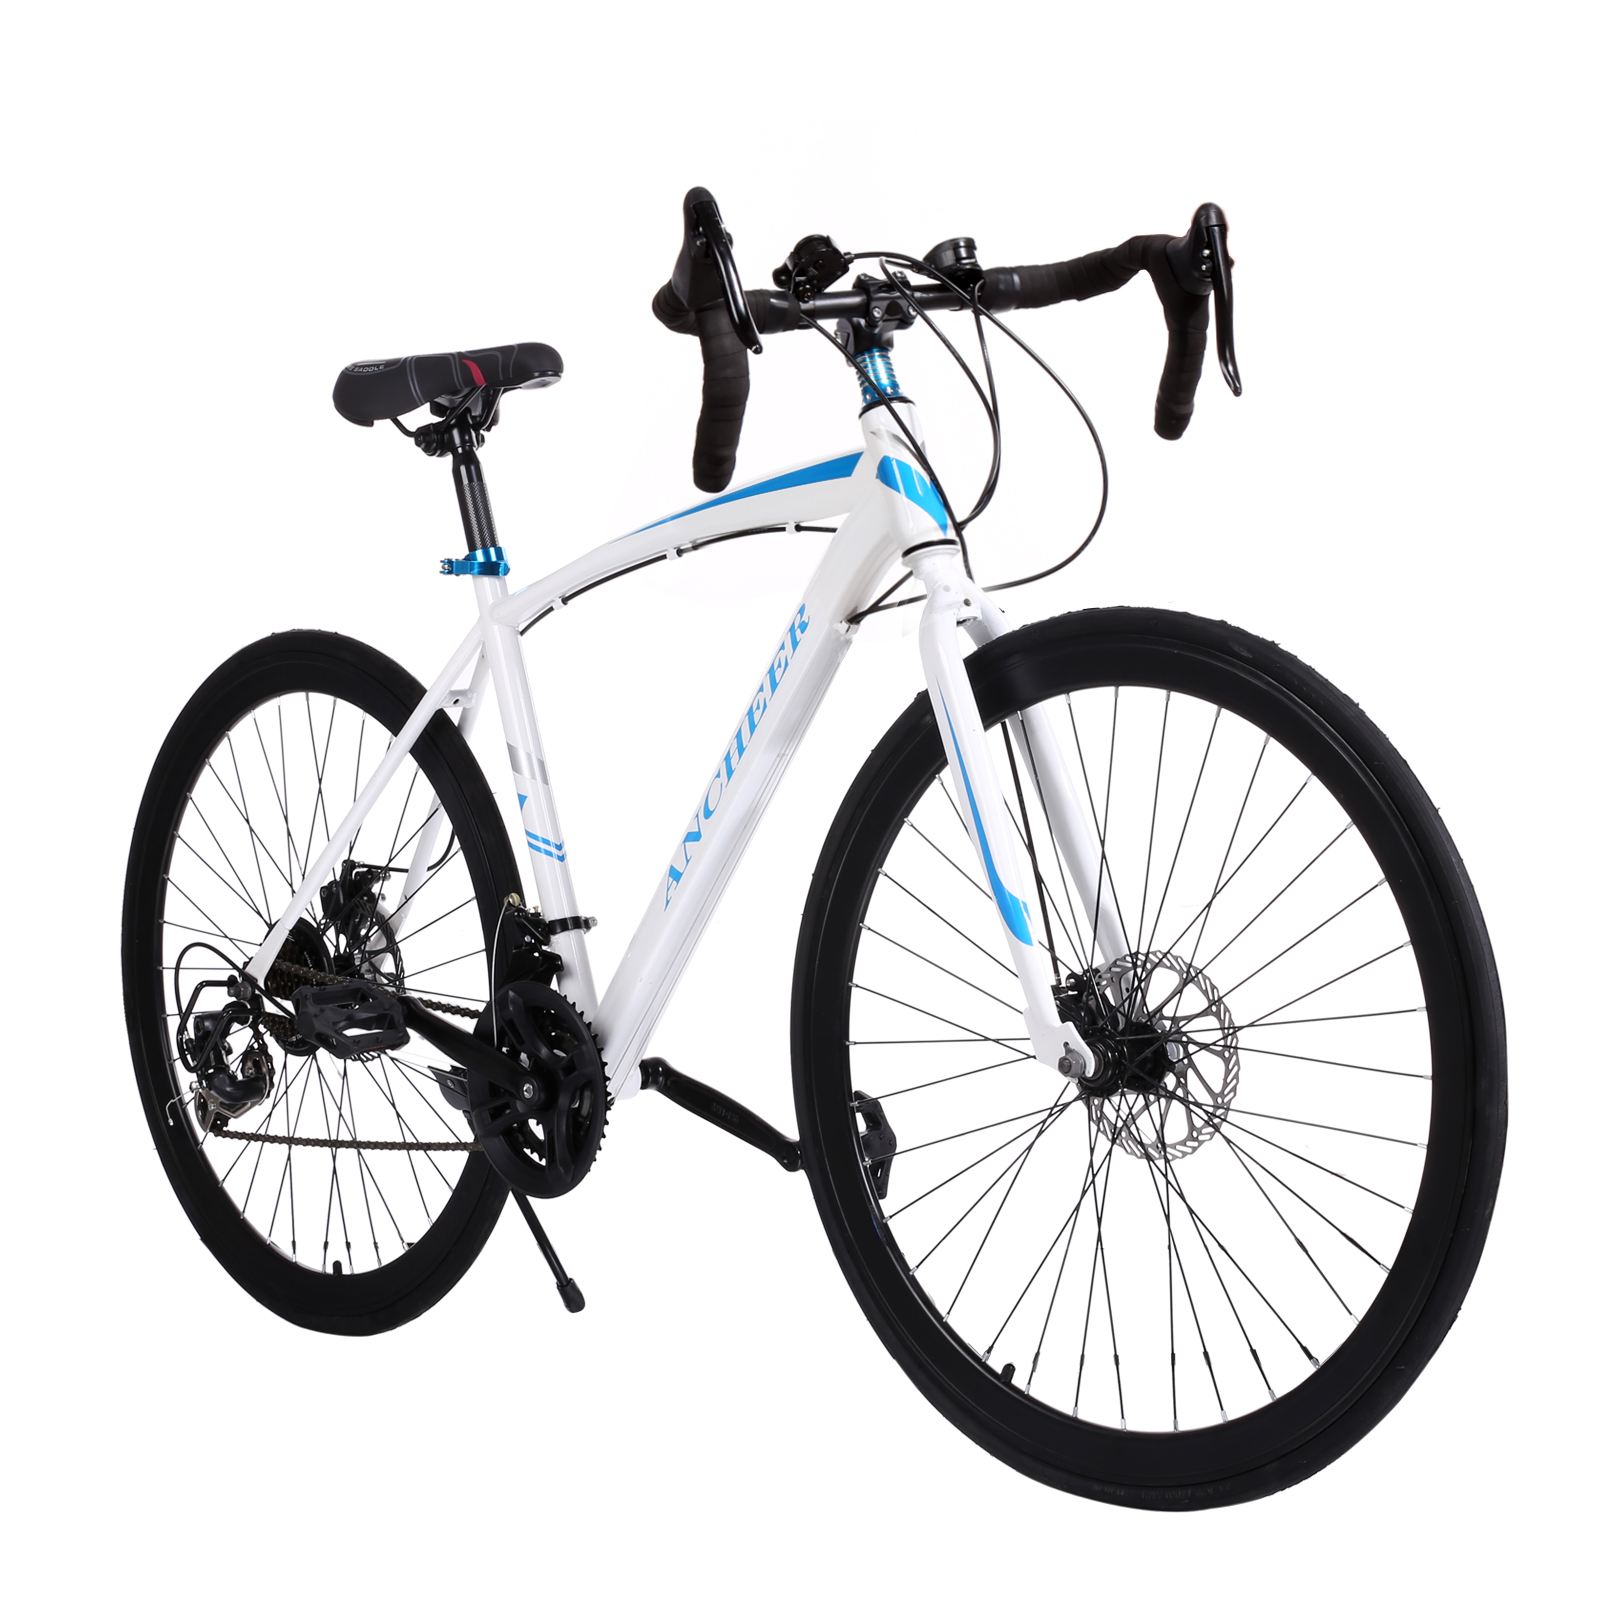 цена на ANCHEER Mountain Bike New 700C Aluminum Fixed Gear Road Bicycle Road Cycling Road Bike 2 Disc Brake Outdoor bike 2017 Hot sale